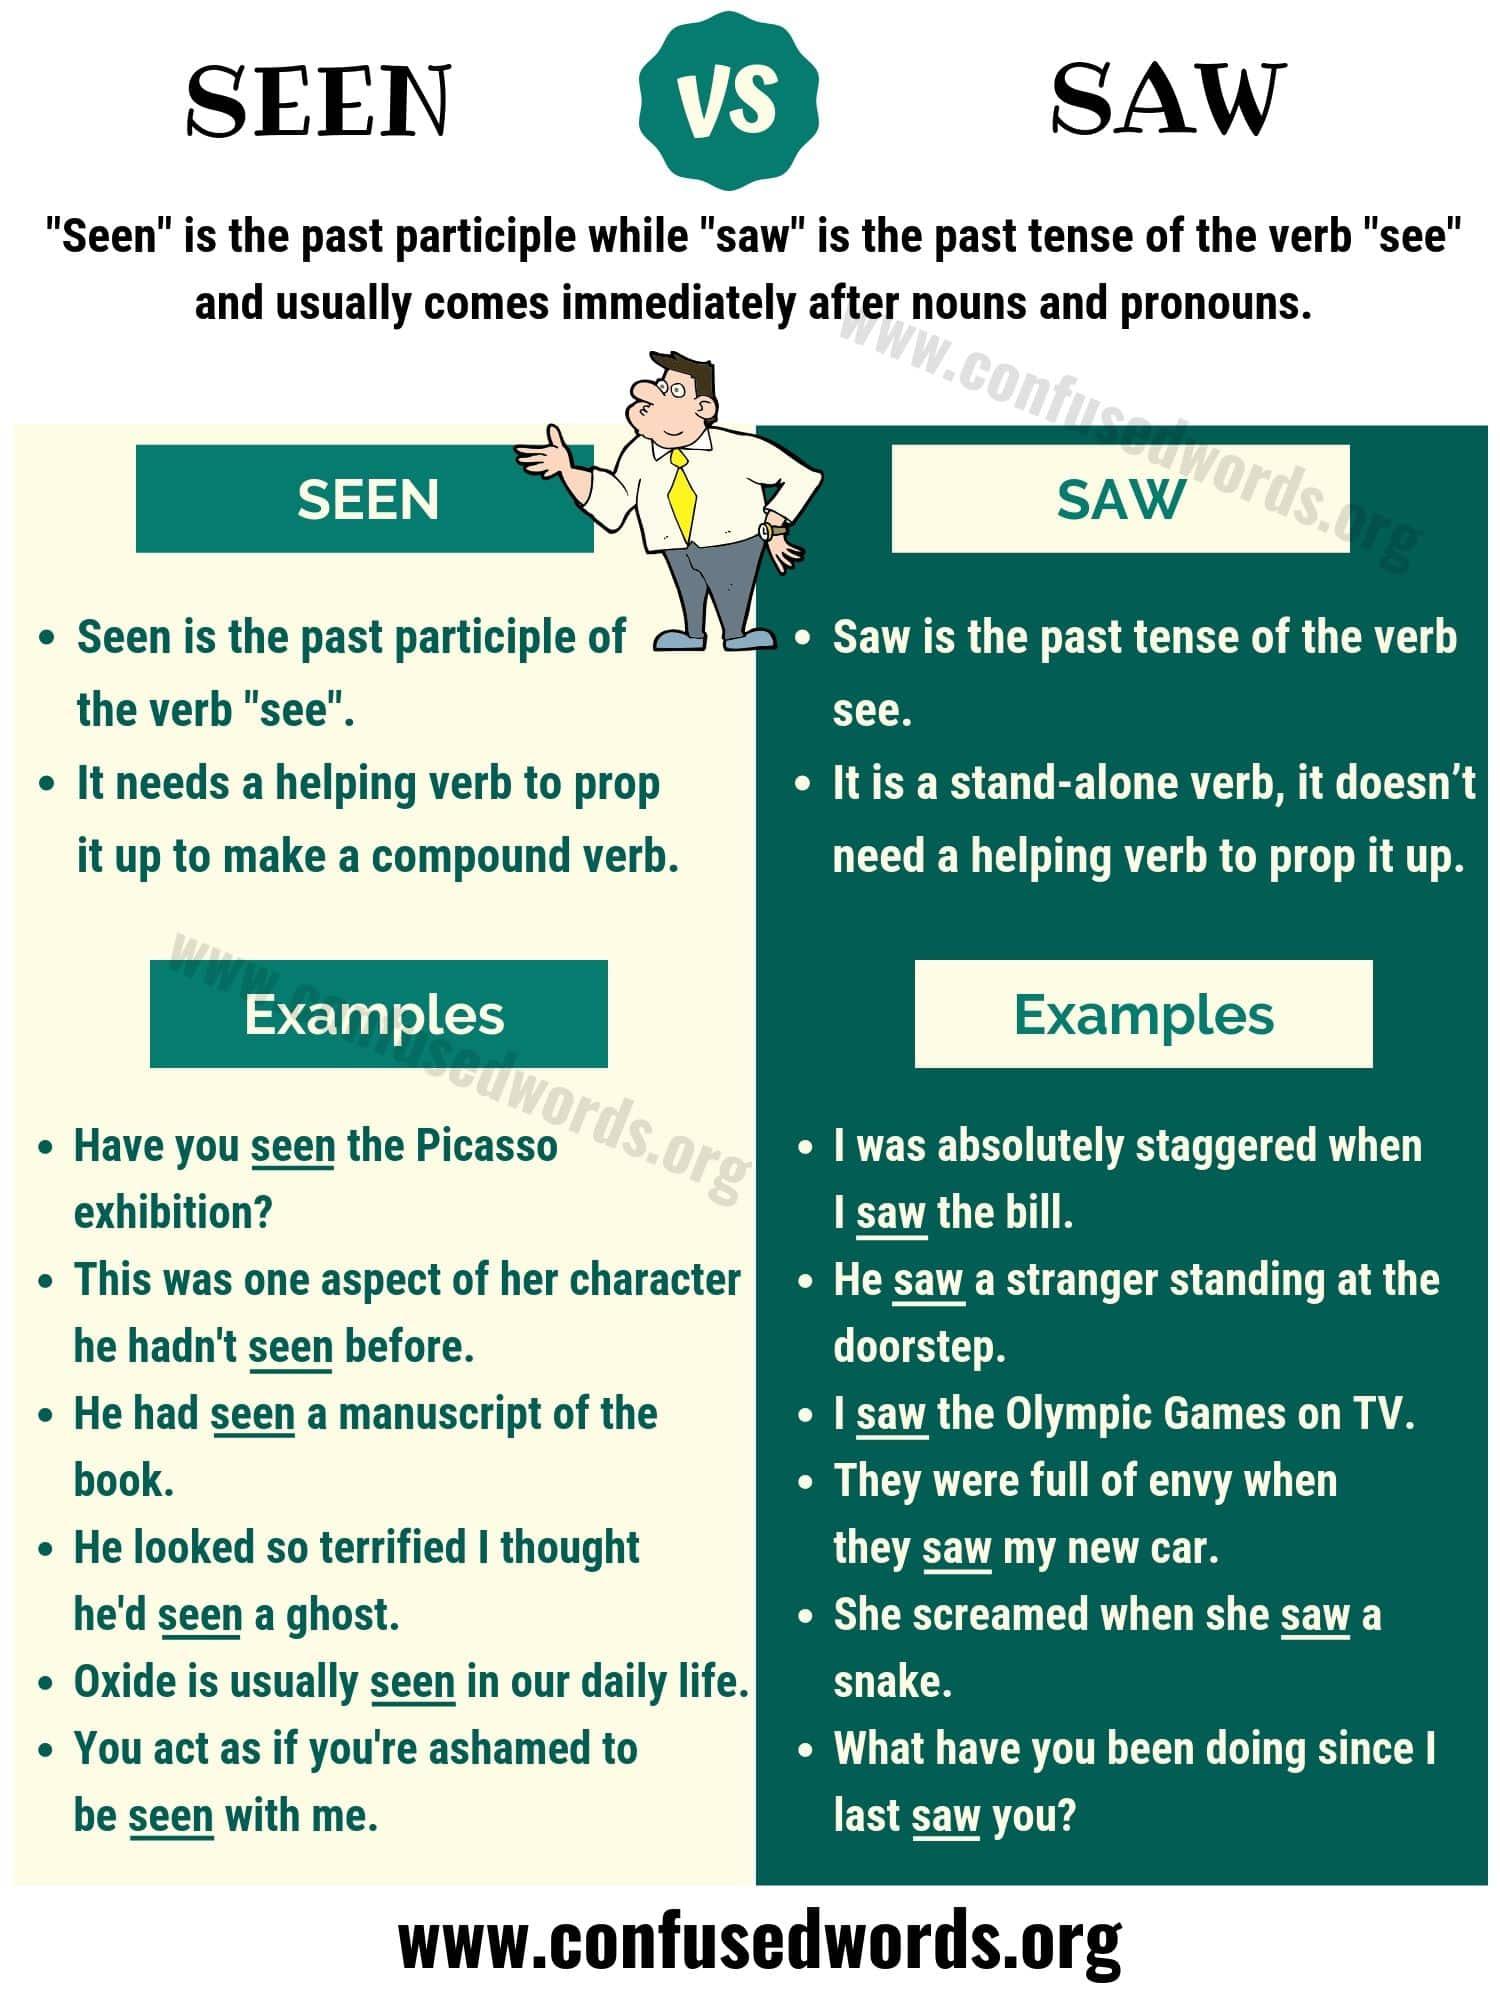 Seen vs Saw